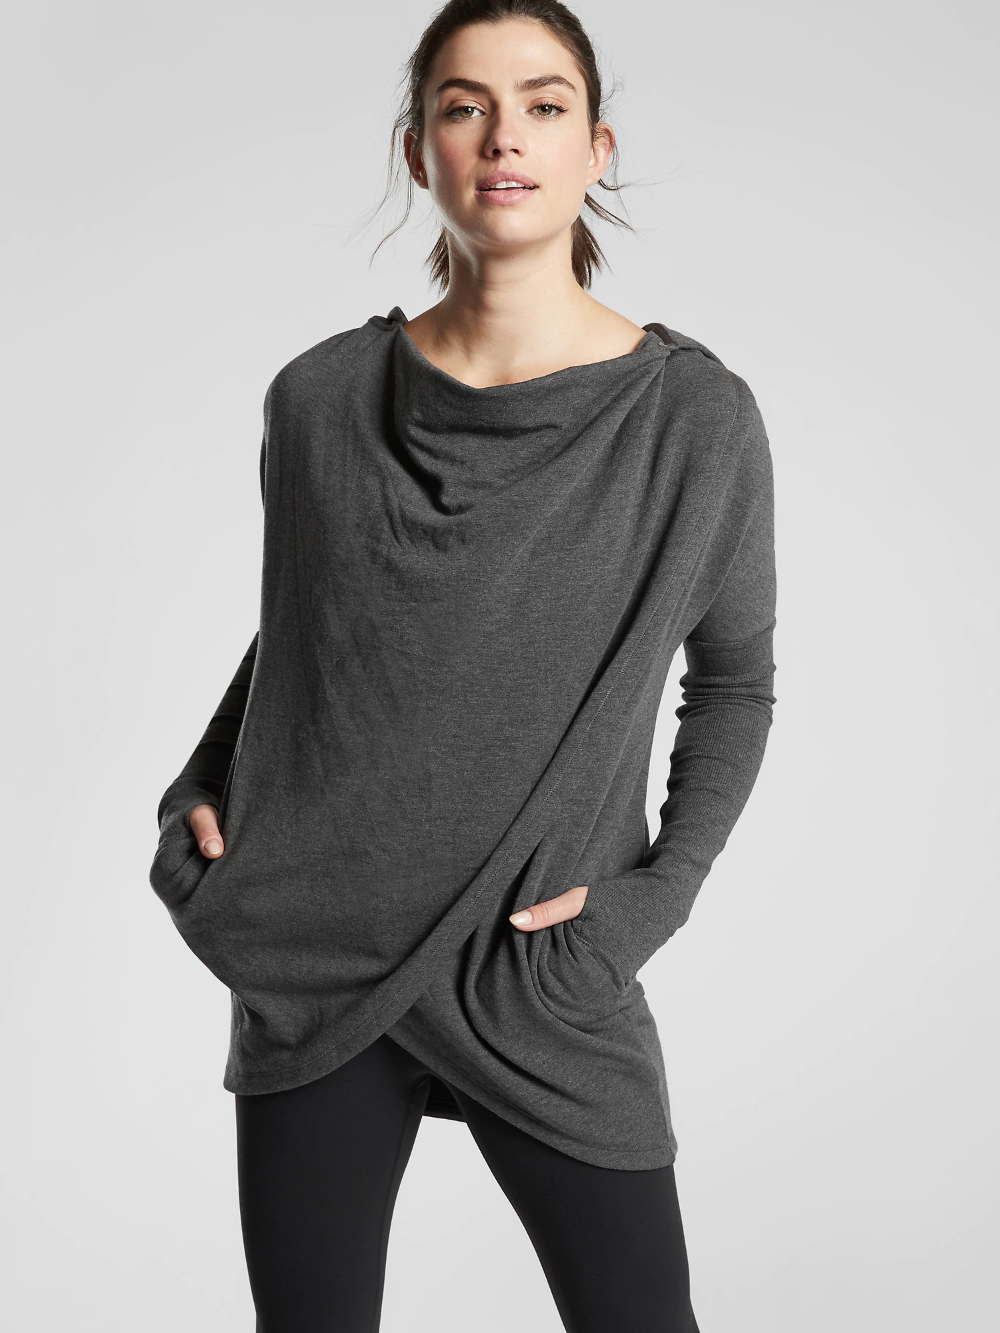 Purana Wrap Sweatshirt Athleta Workout Tops For Women Sweatshirts Athletic Tops Women [ 1333 x 1000 Pixel ]